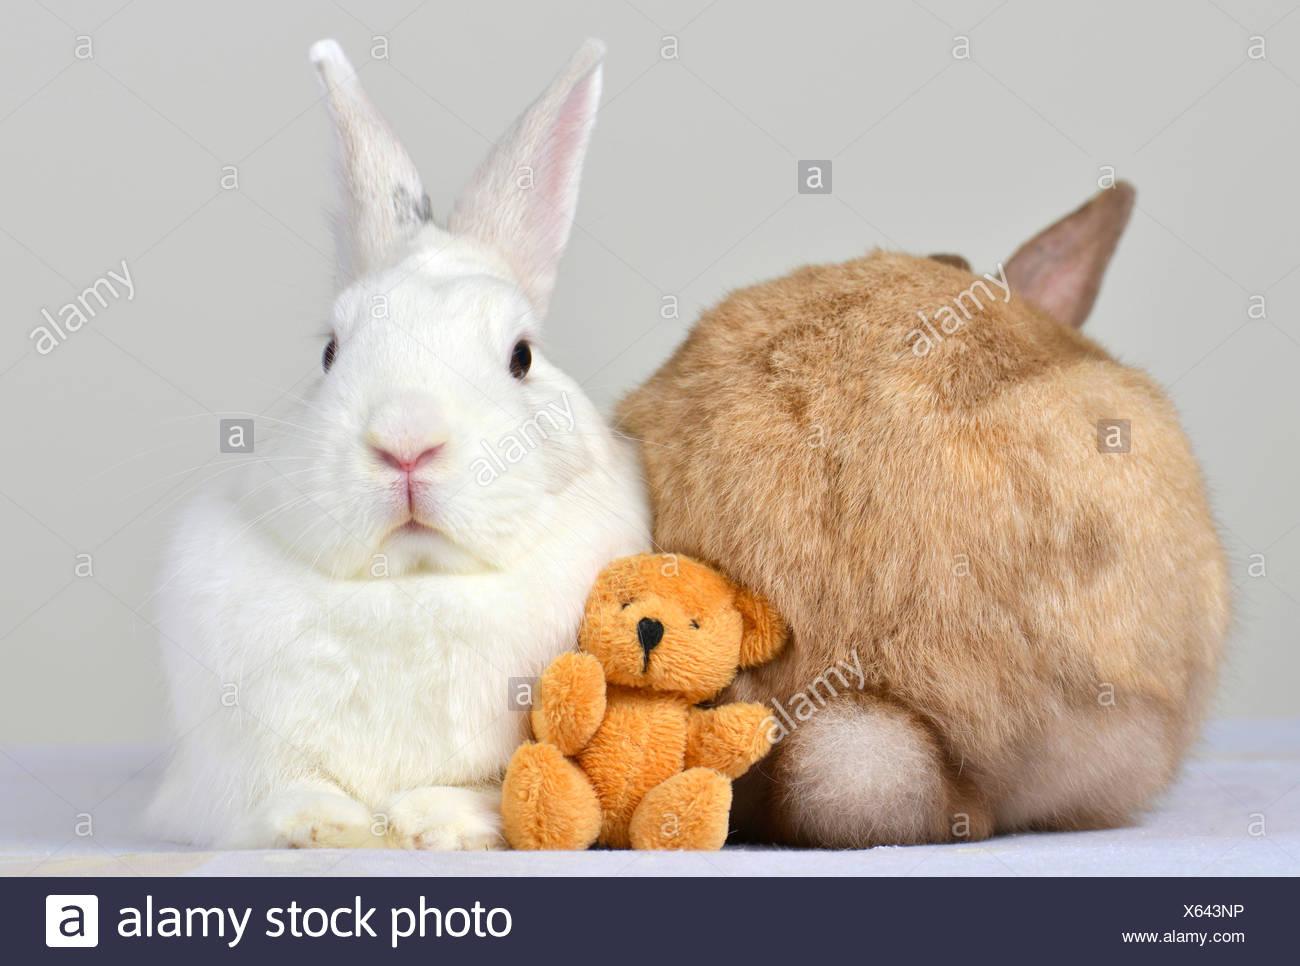 teddy dwarf rabbits stock photos teddy dwarf rabbits stock images